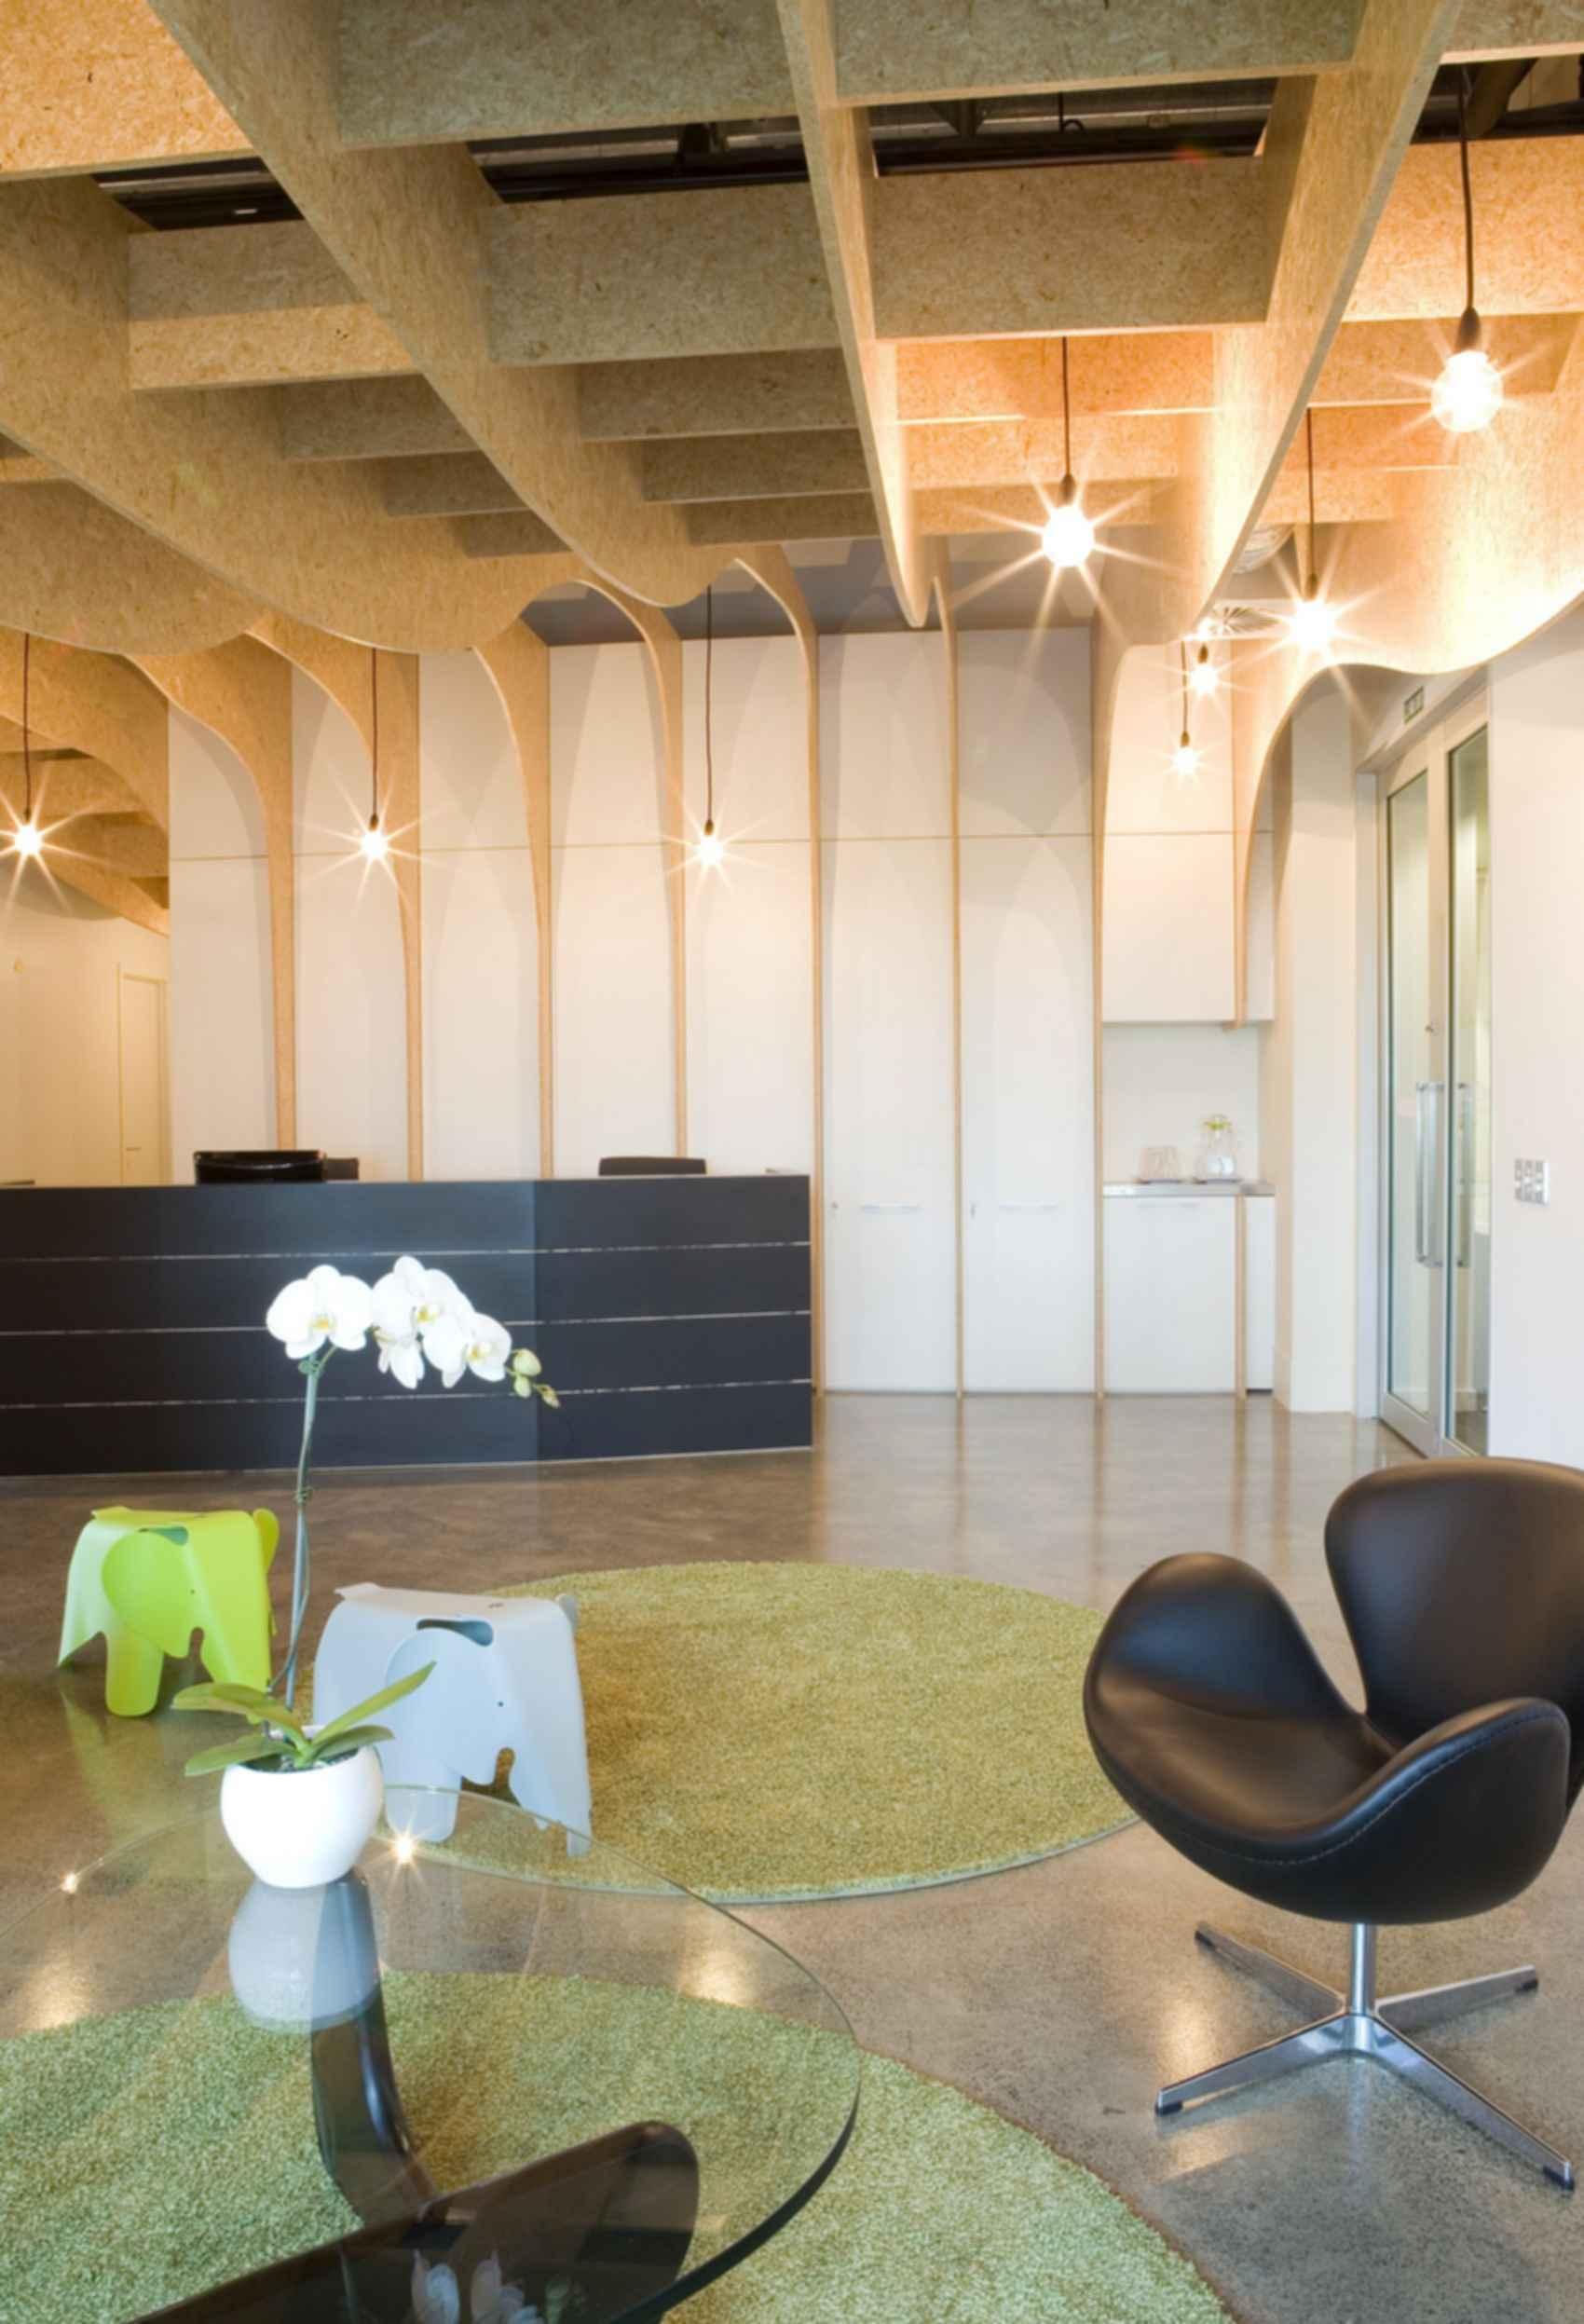 Clinic Interior - Waiting Area